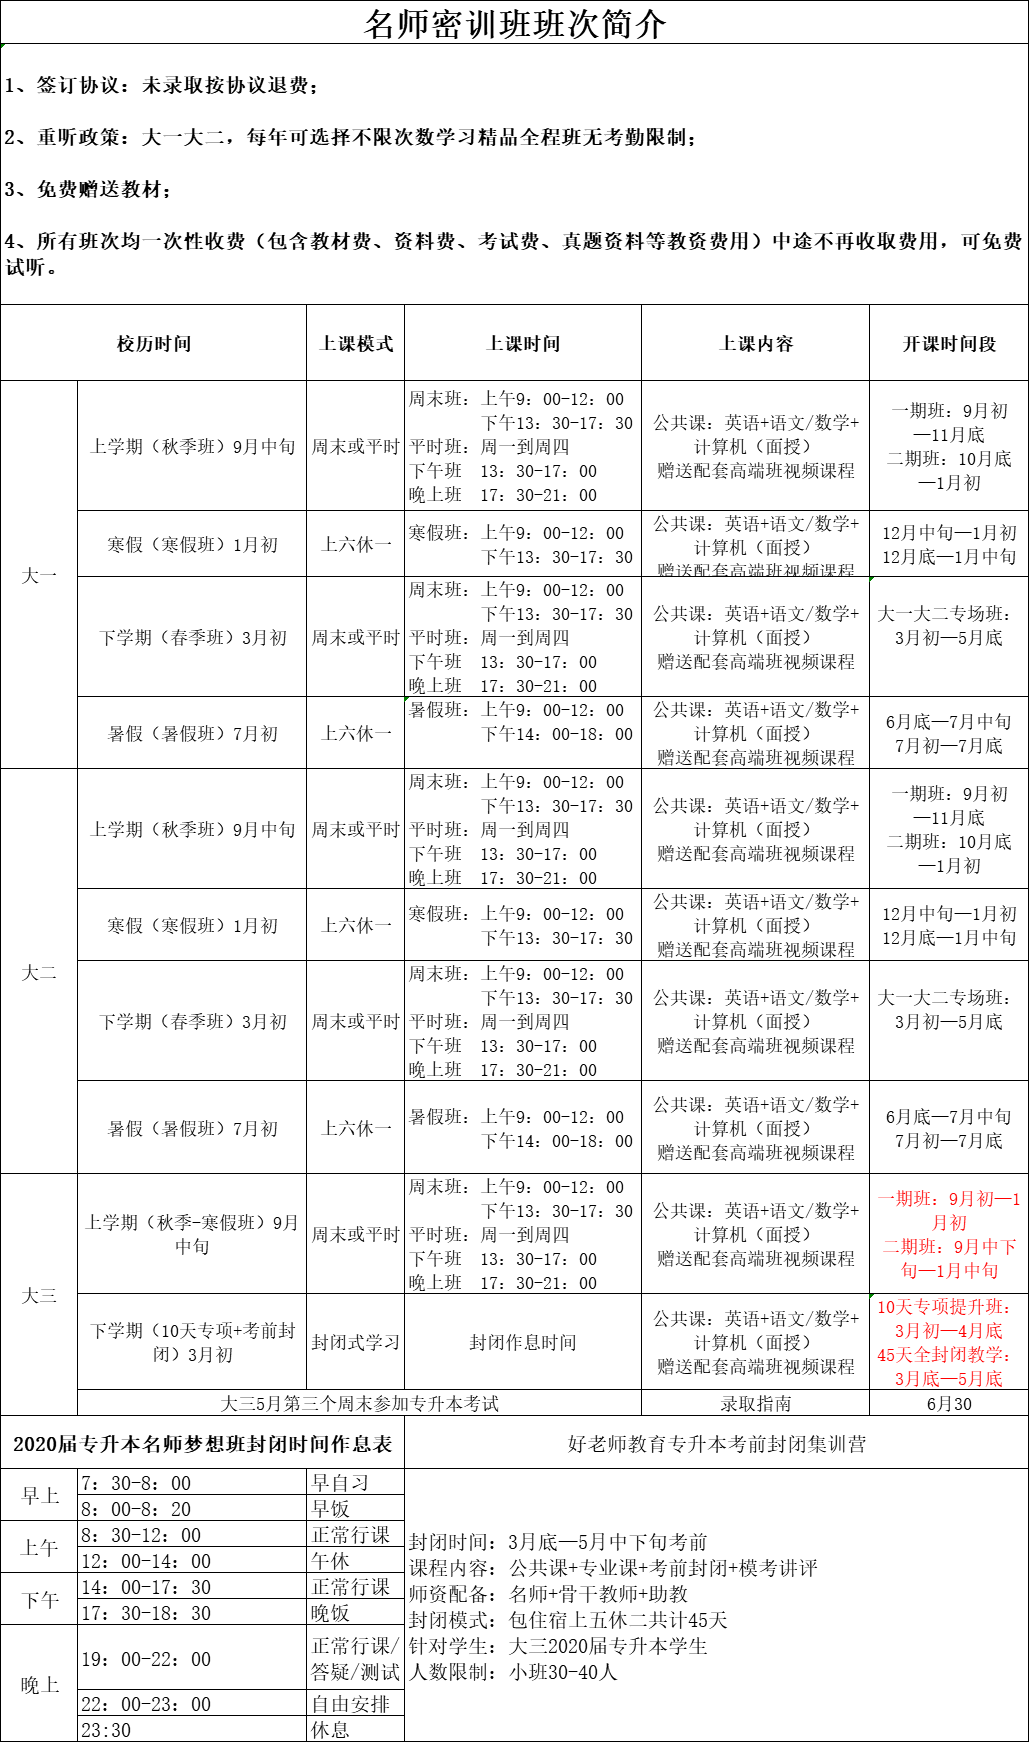 ueditor/20190907/1567860986_名师密训班.png